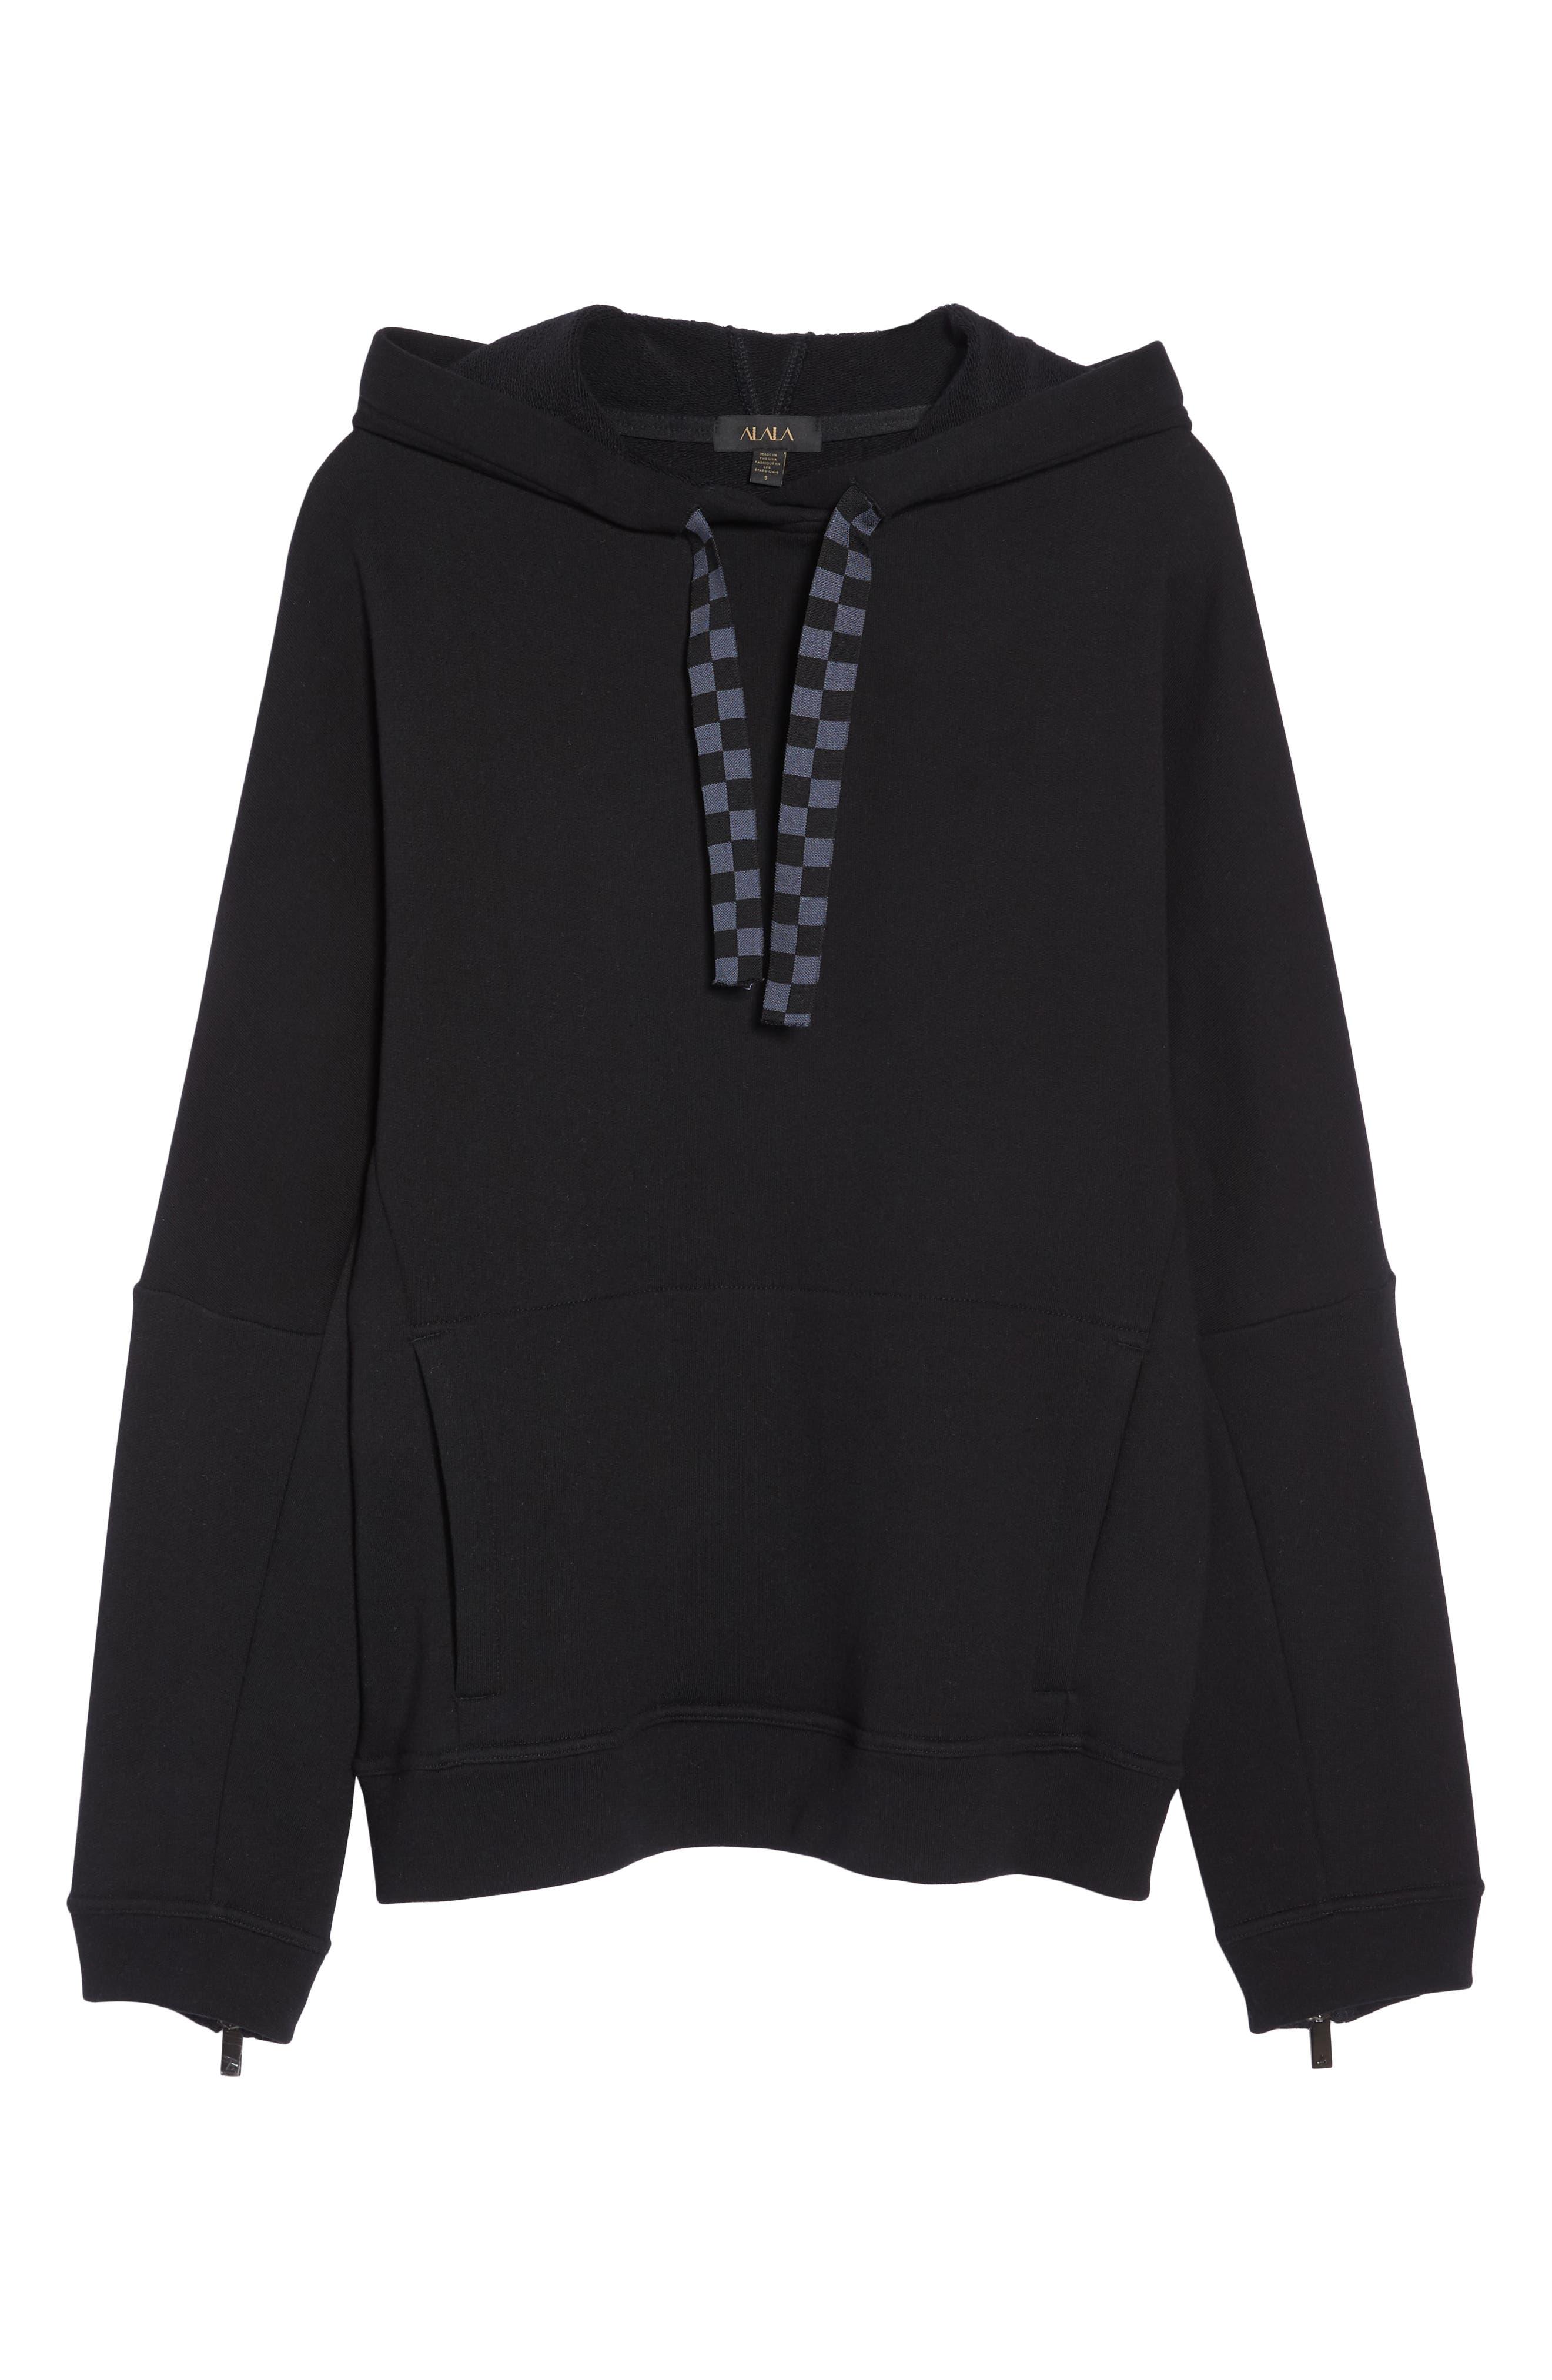 Shift Hoodie Sweatshirt,                             Alternate thumbnail 7, color,                             BLACK/ CHECKER